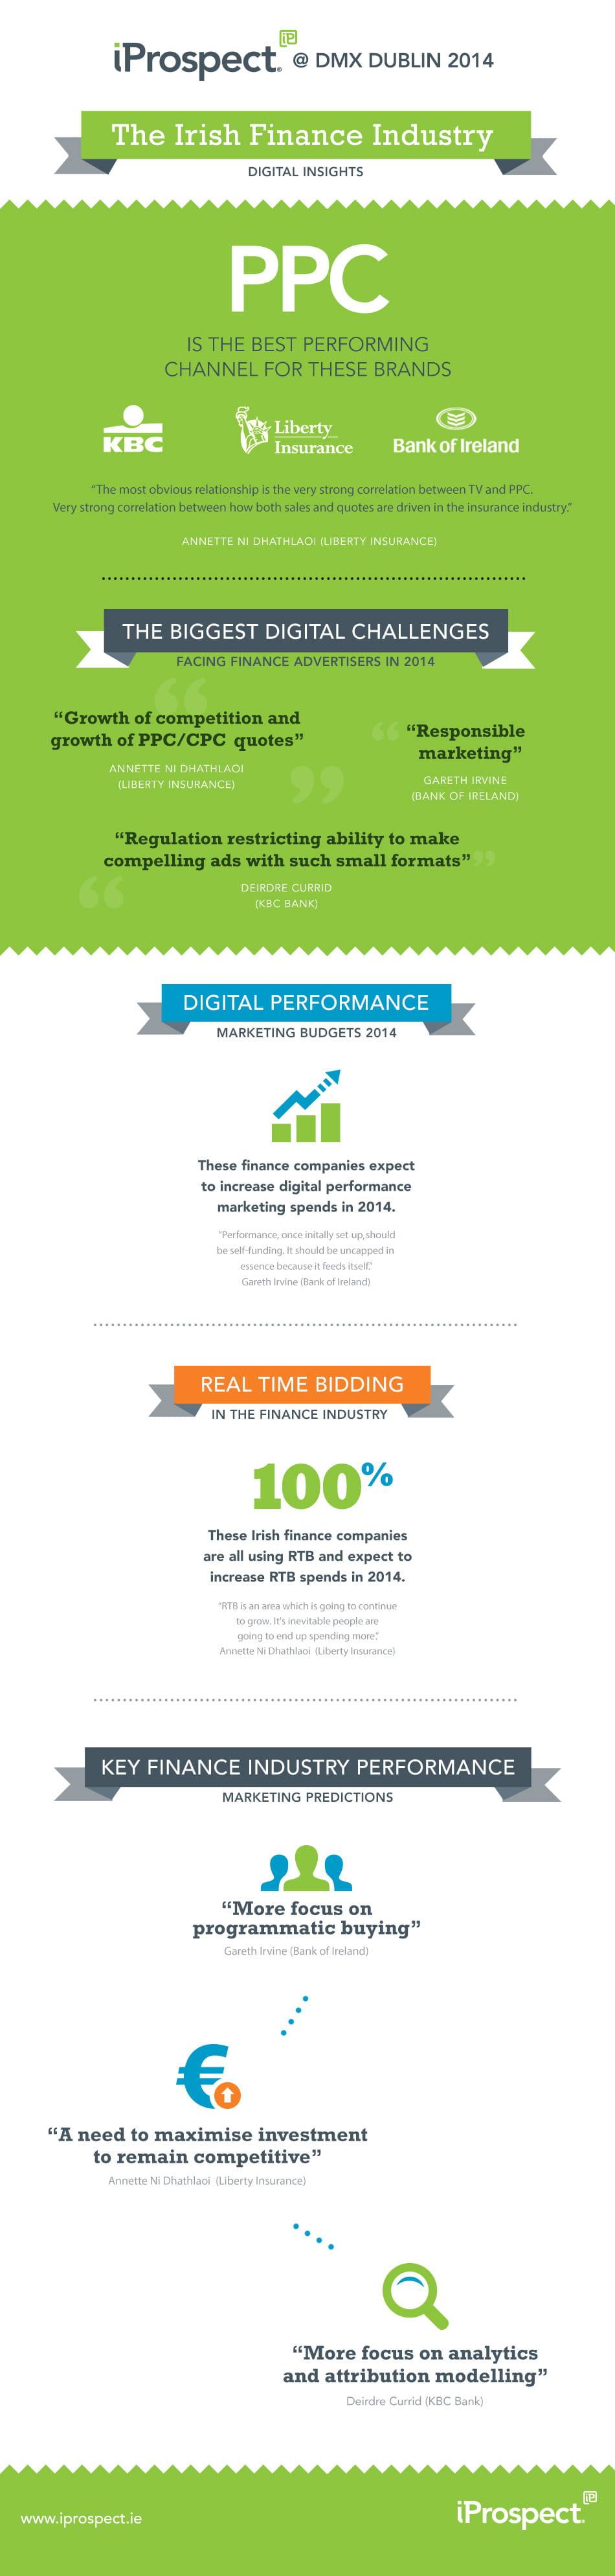 Irish Finance Digital Insights Infographic | iProspect Ireland